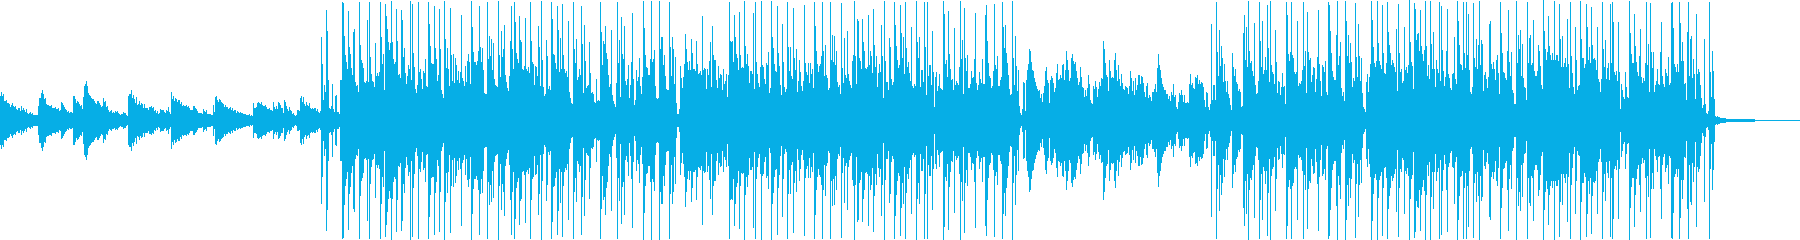 Lo-fi Hip Hop風のBGMですの再生済みの波形